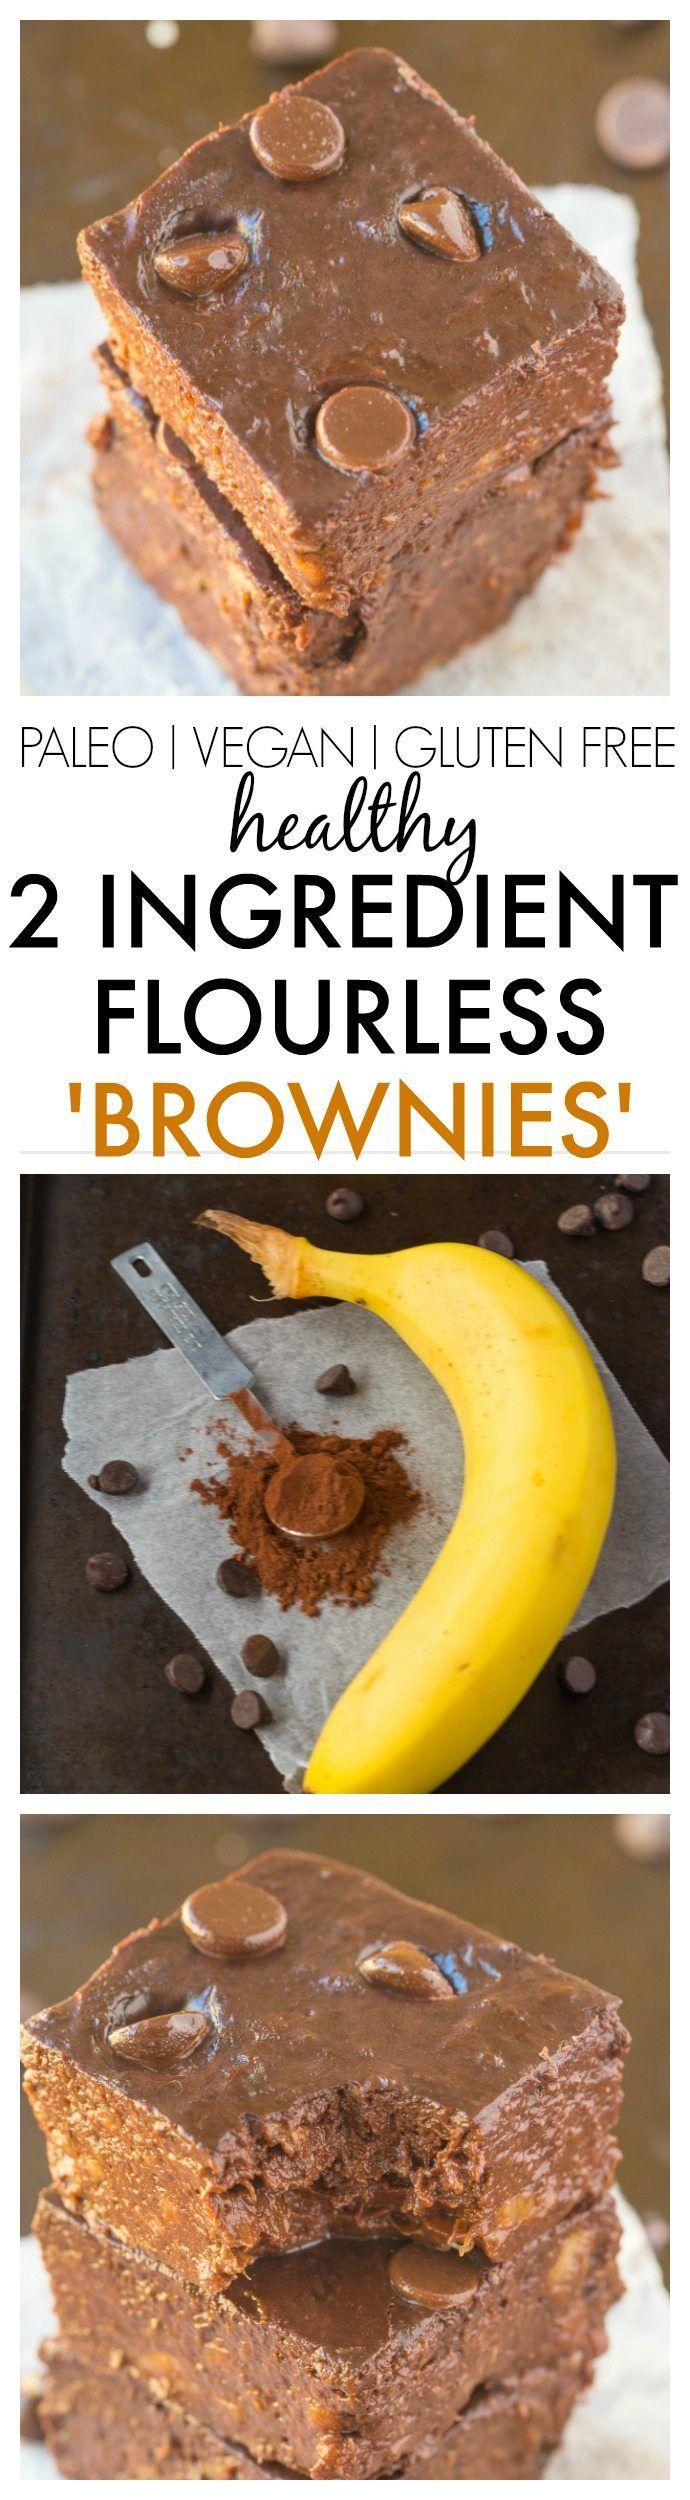 Super easy 2 ingredient recipes